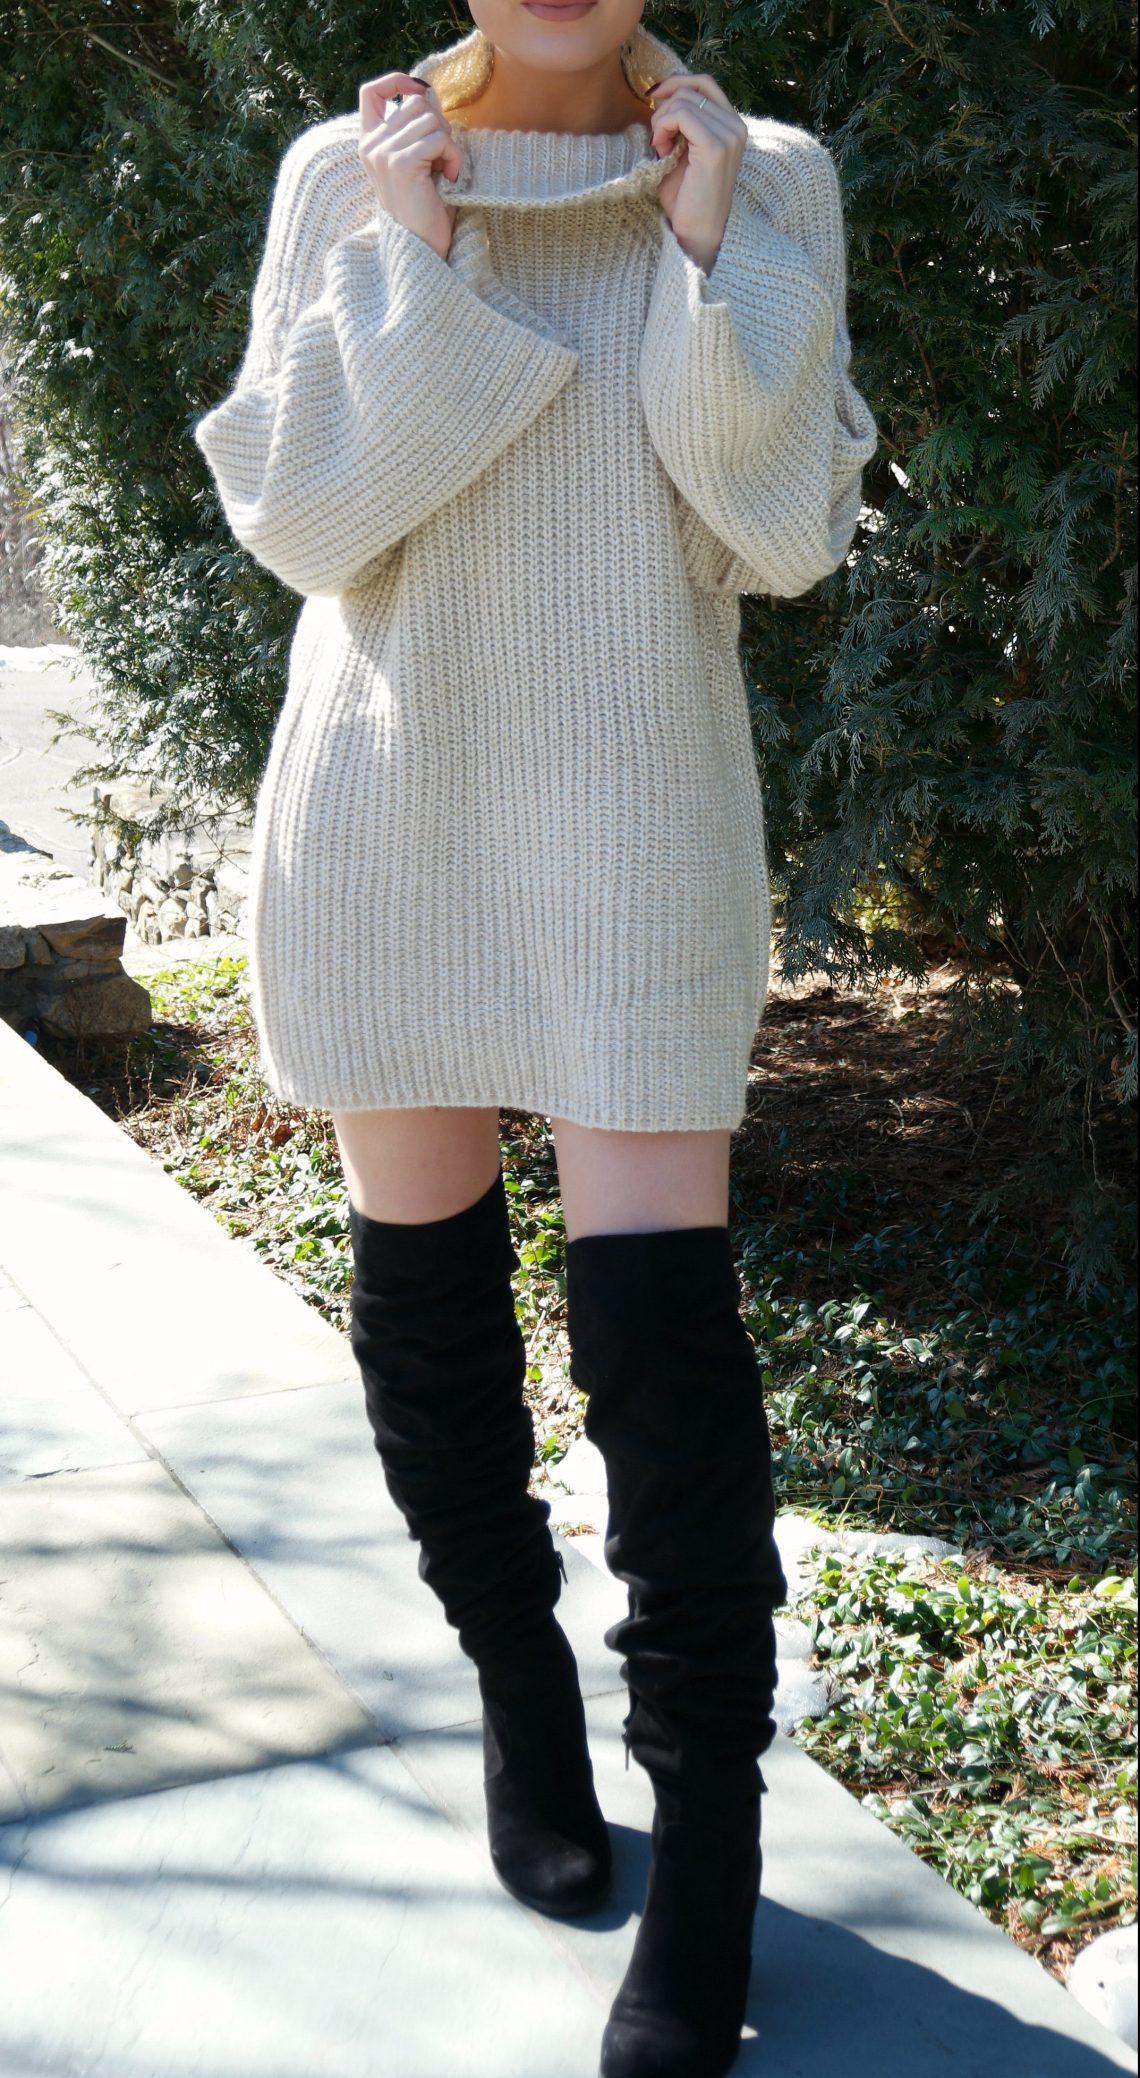 shein-oversized-turtleneck-sweater-dress-2